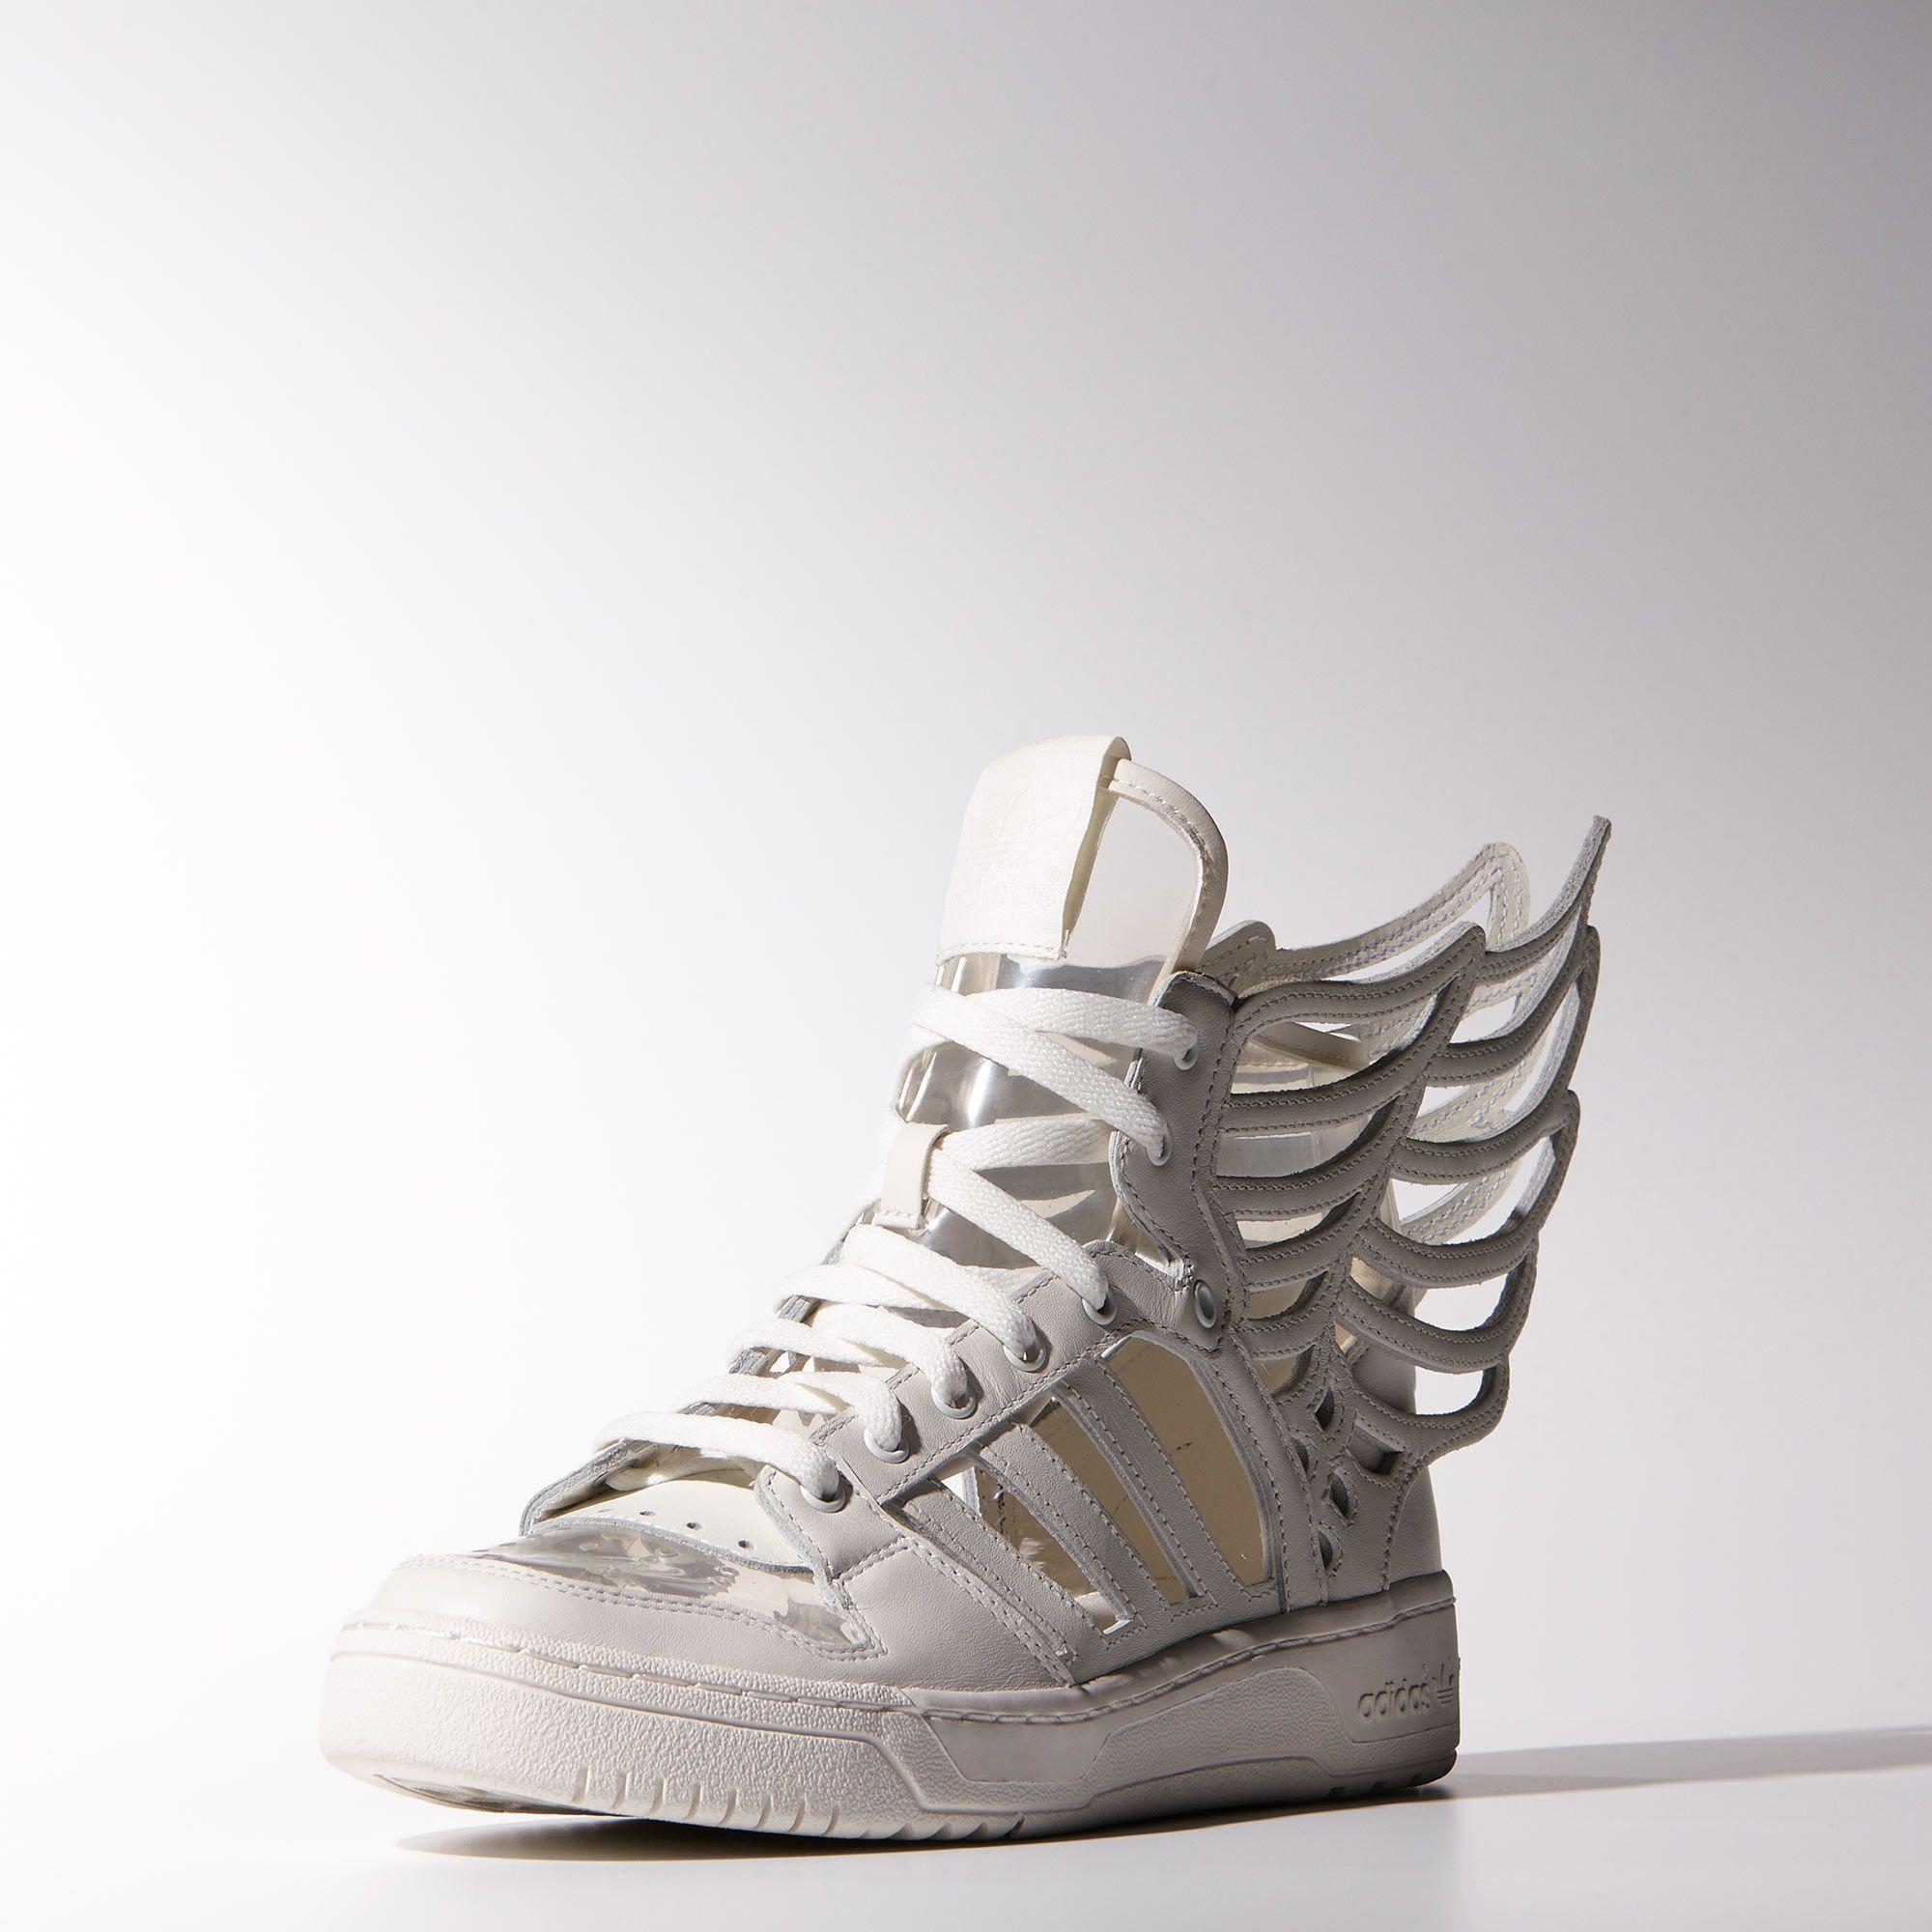 adidas Wings 2.0 Cutout Schoenen